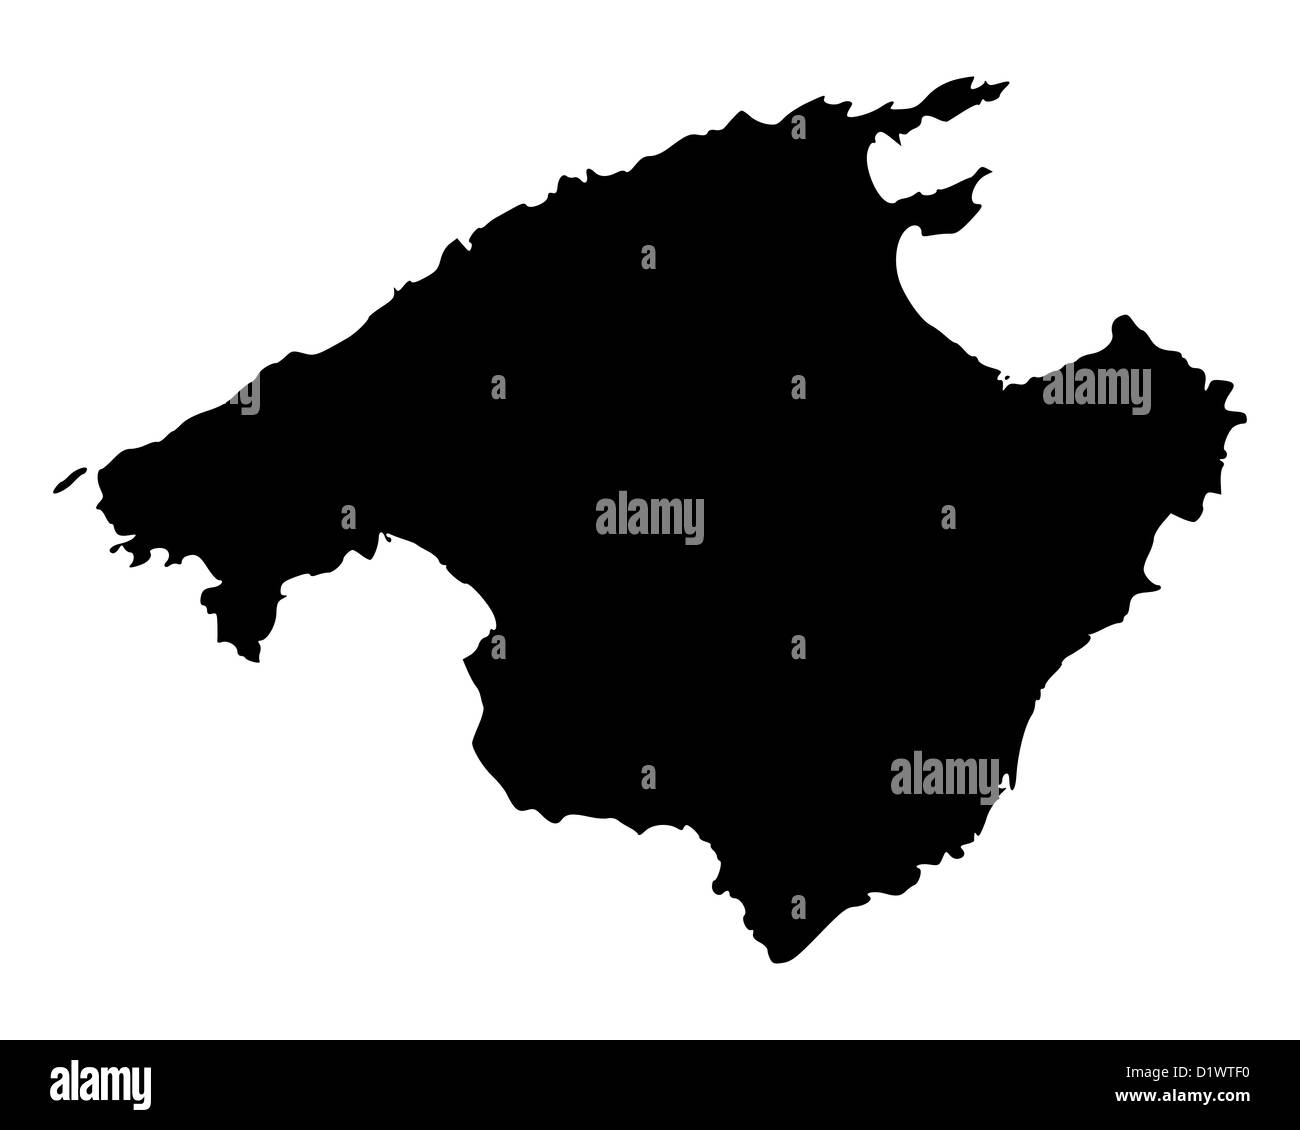 Mallorca Map Stock Photos & Mallorca Map Stock Images - Alamy on malta map, catalonia independence map, mediterranean sea map, barcelona map, canary islands map, palma map, world map, menorca map, lanzarote map, hong kong map, pyrenees mountains map, copenhagen map, naples map, majorca map, croatia map, ibiza map, malaga map, poland map, marseille map,